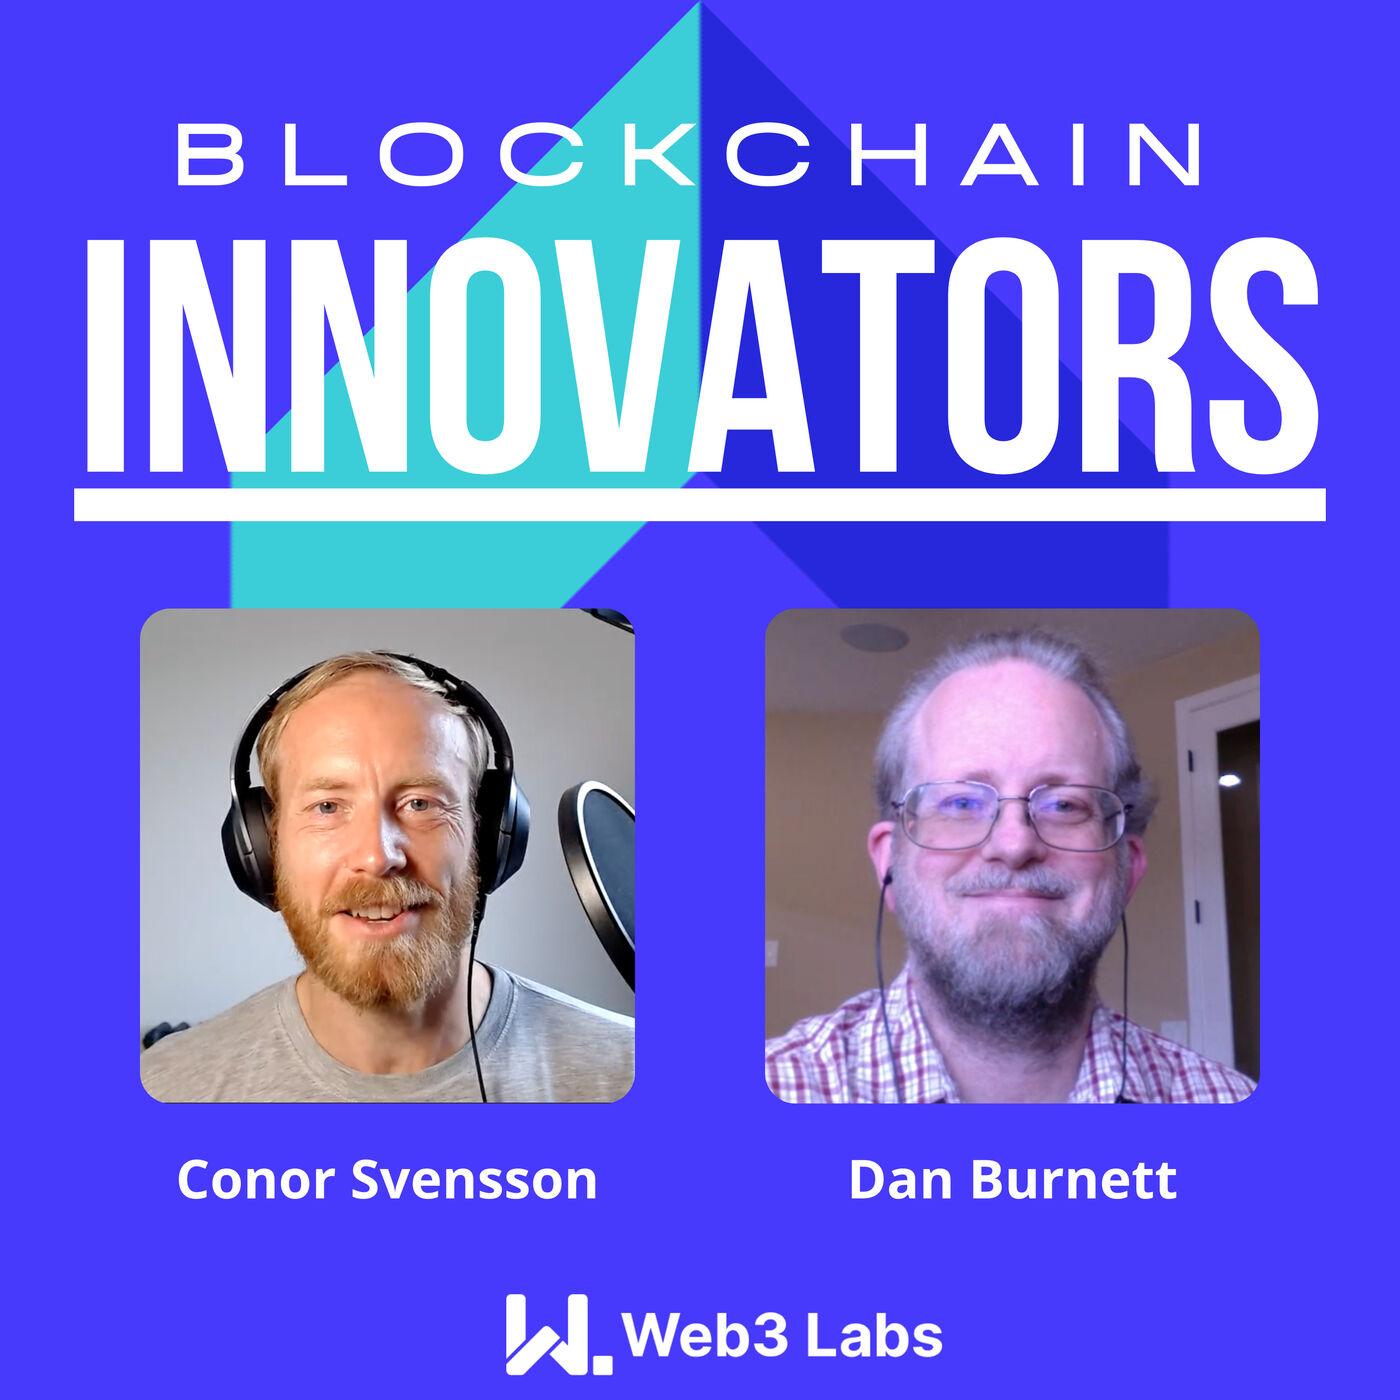 Blockchain Innovators - Conor Svensson and Dan Burnett